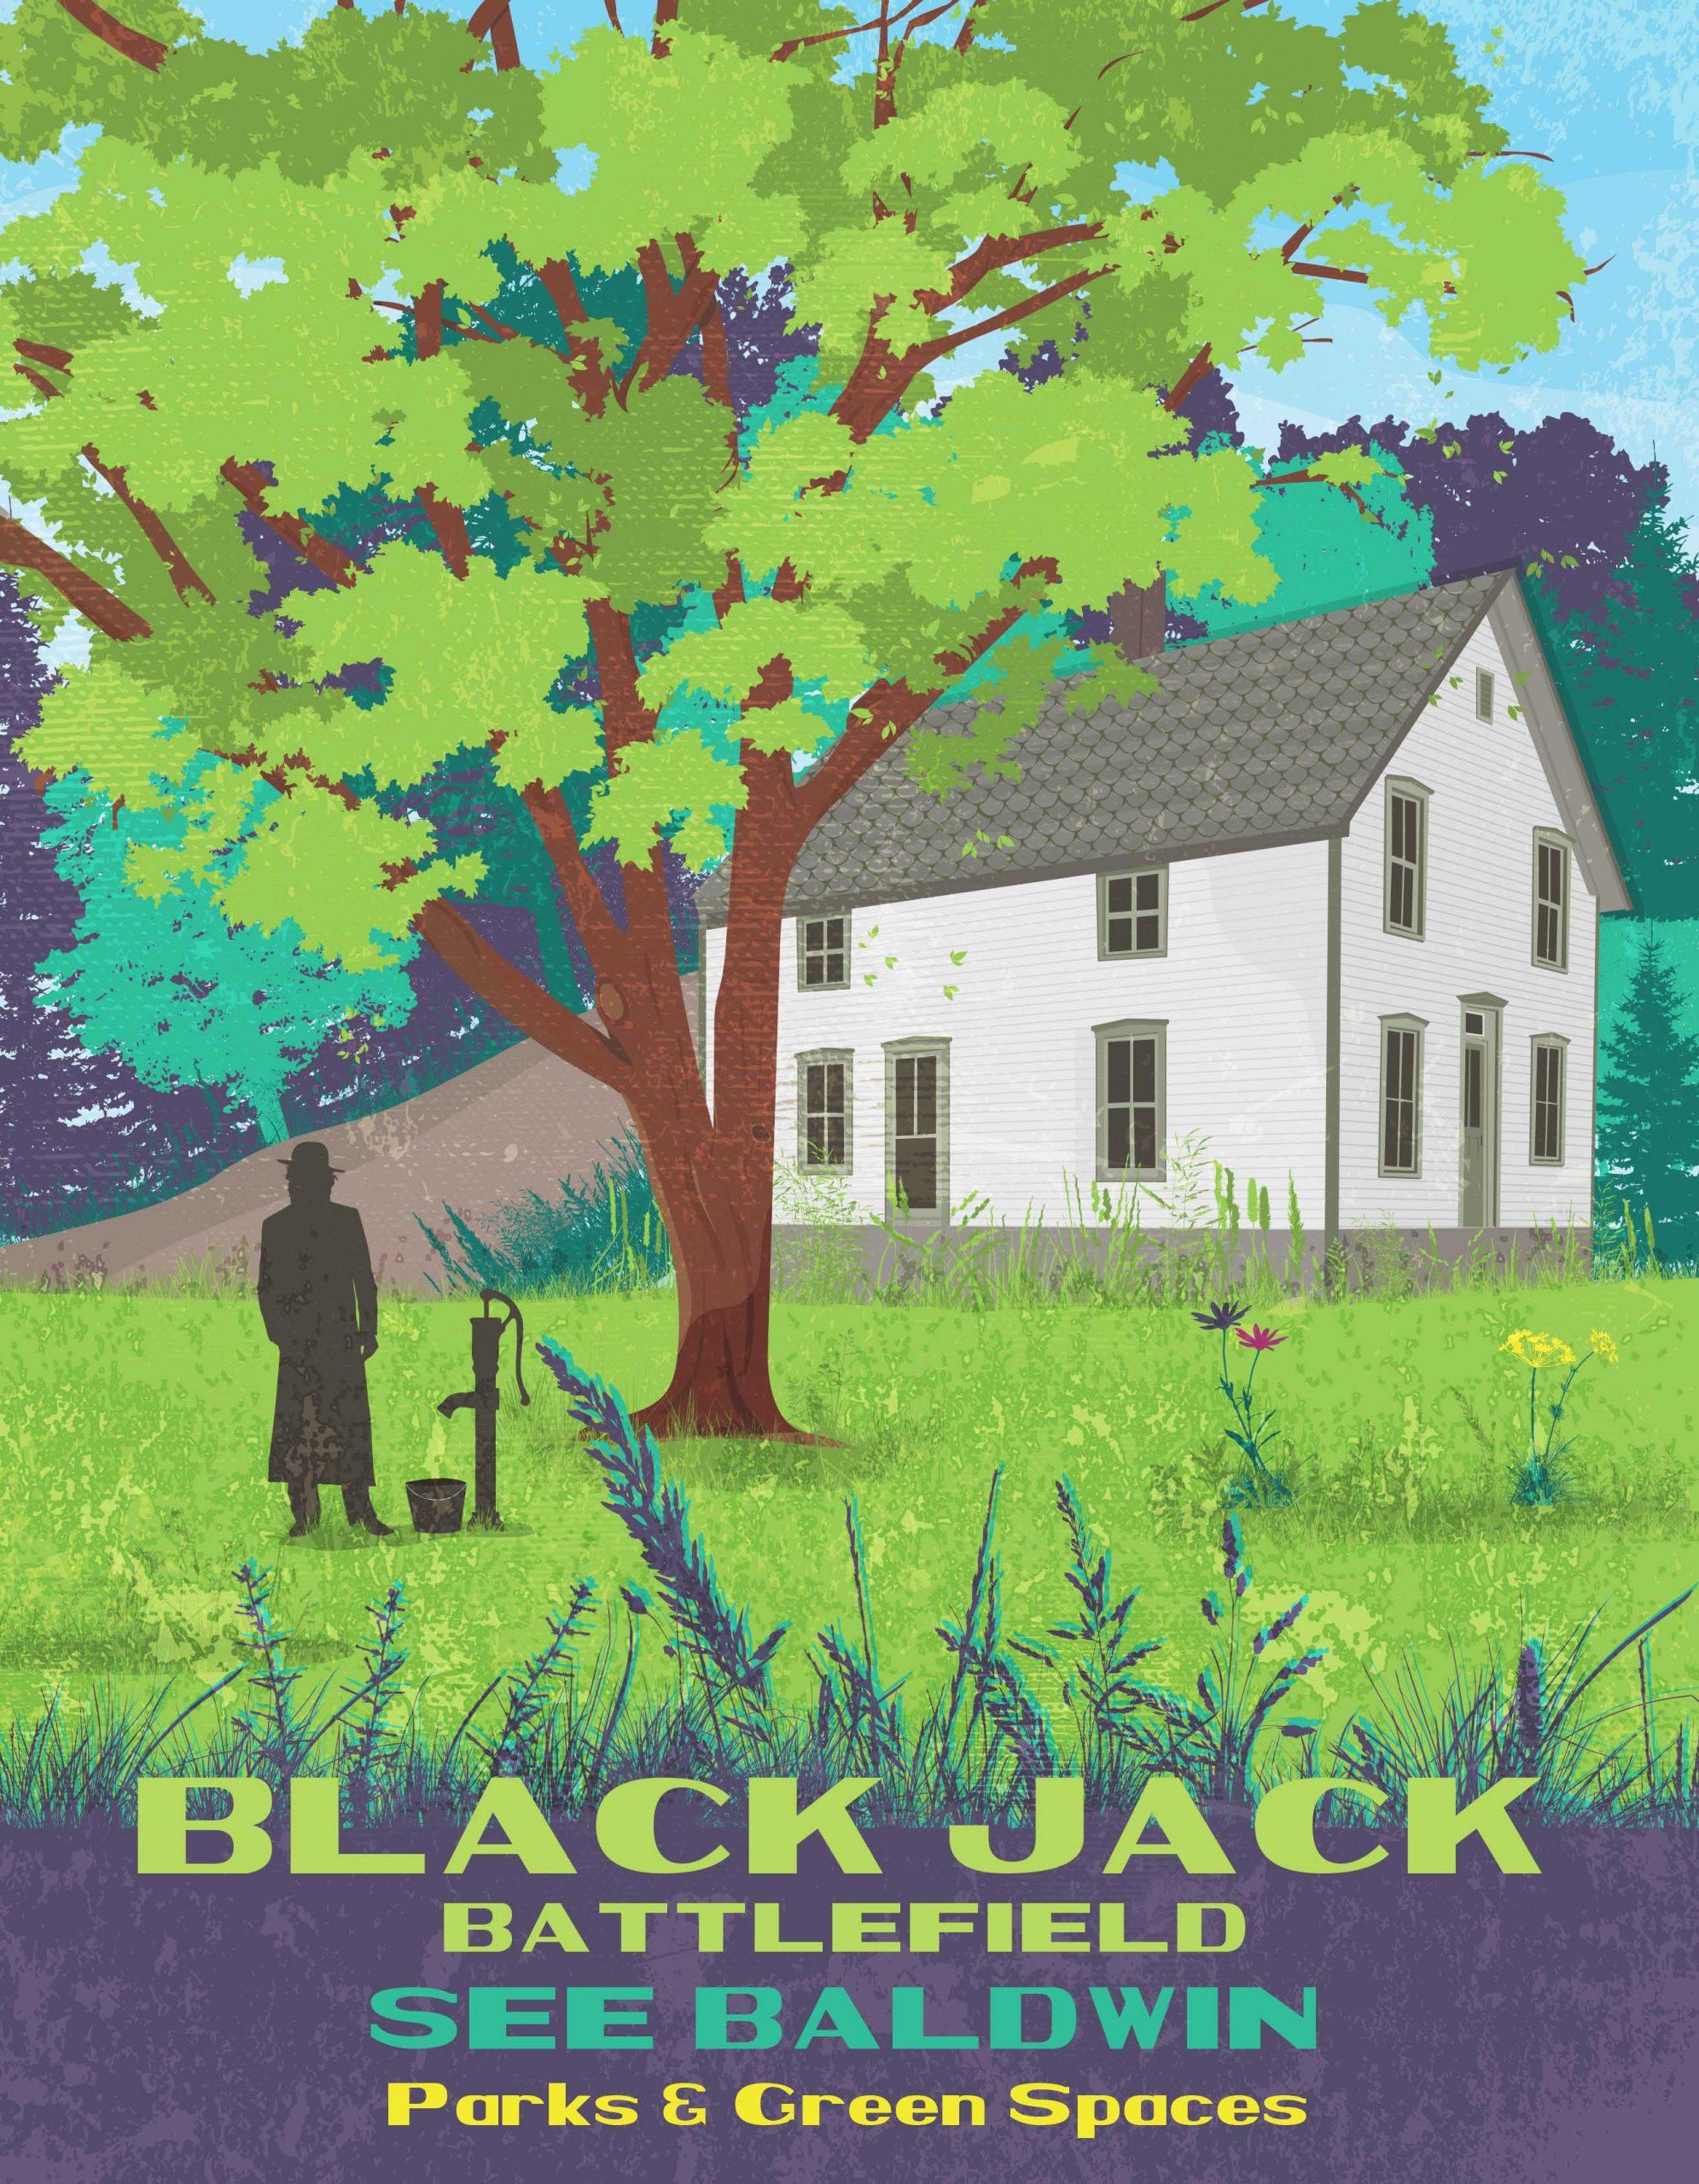 Black Jack Battlefield